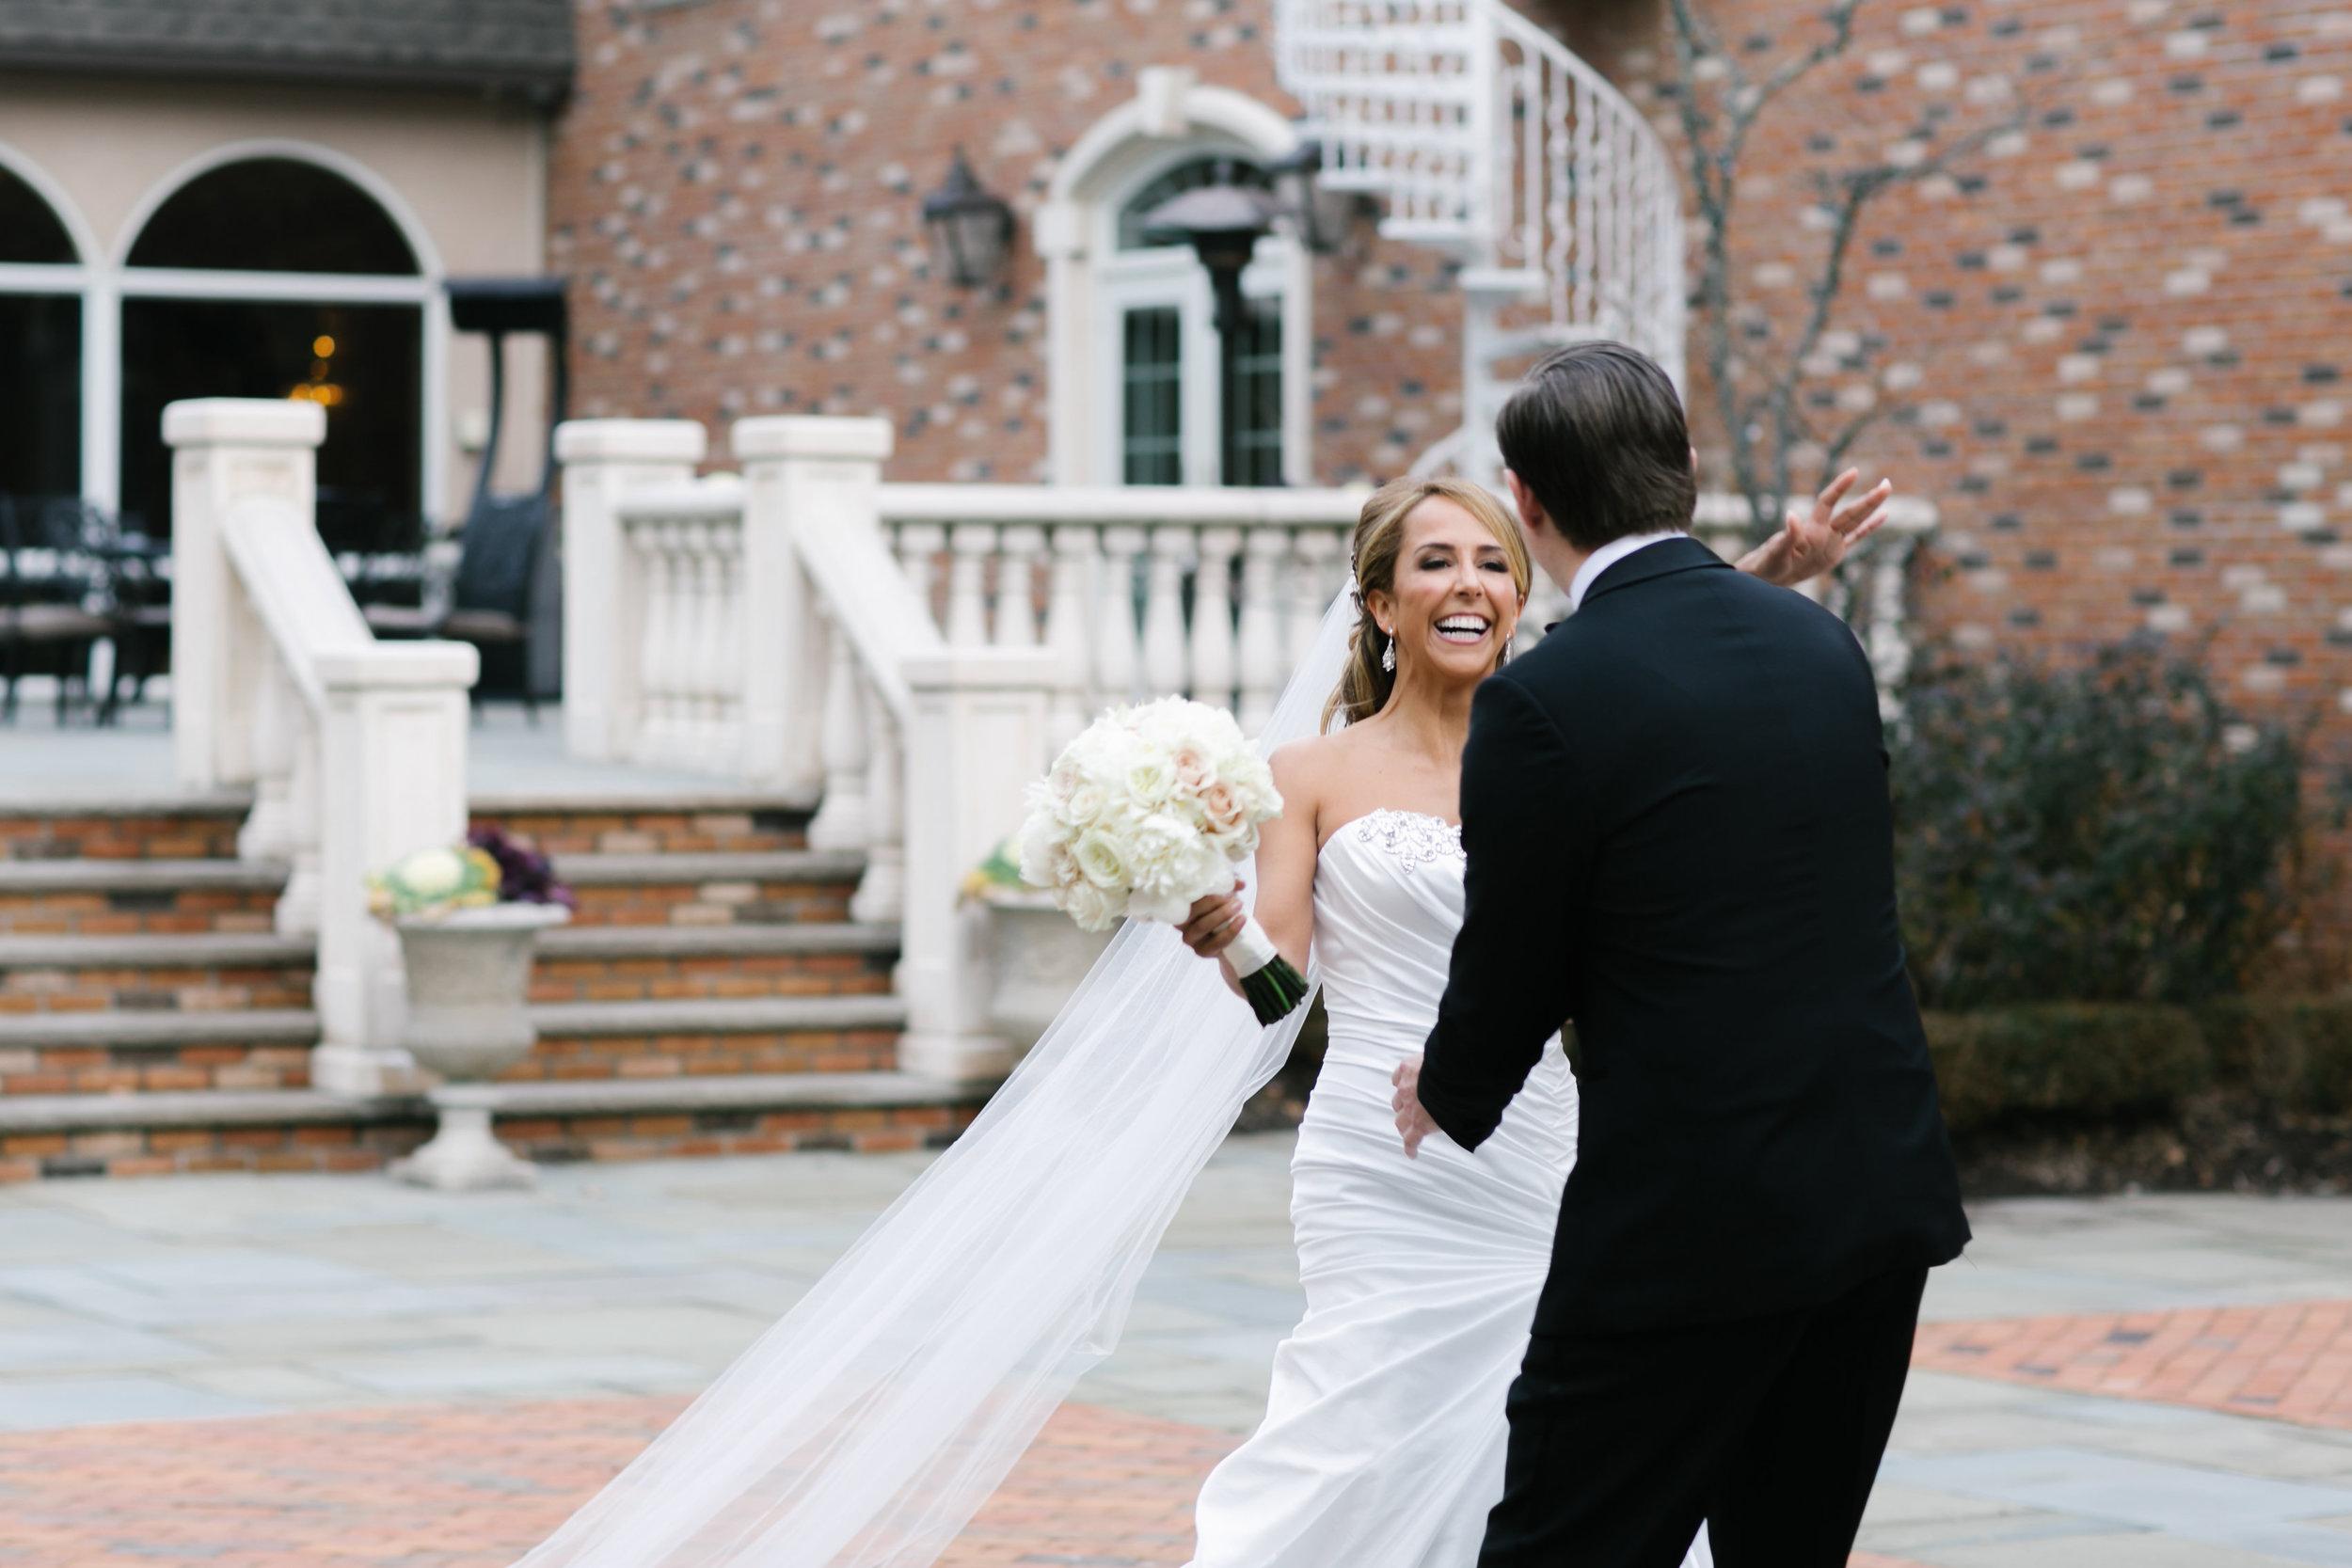 Ceci_New_York_Custom_Invitation_ New_Jersey_Wedding_Luxury_Personalized_Ceci_Style_Bride_Foil_Stamping23.jpg